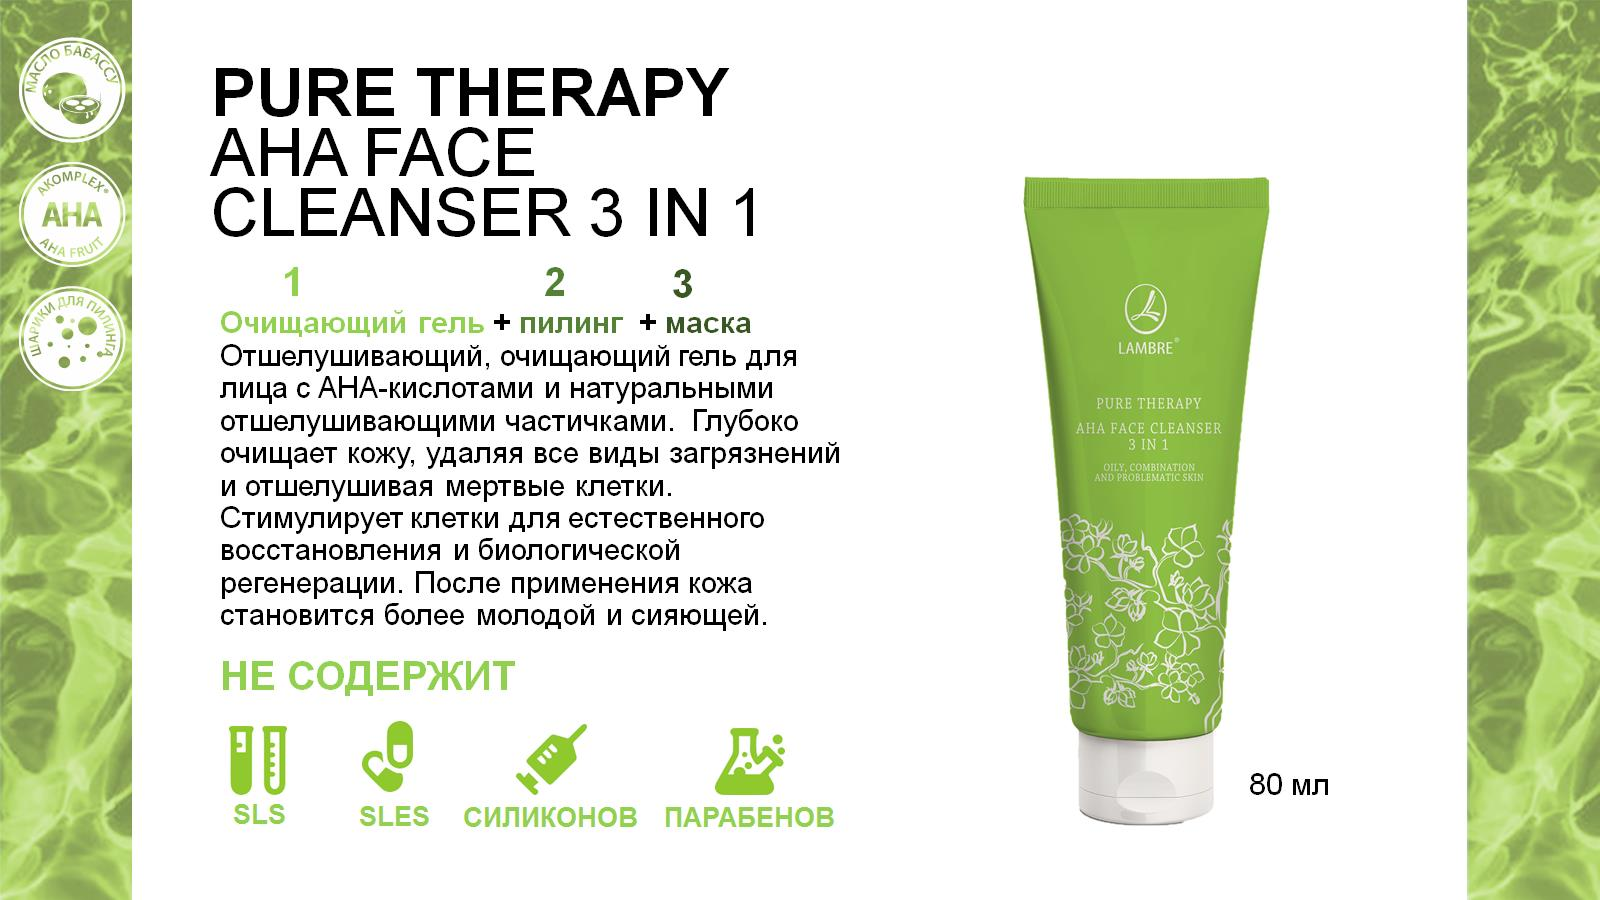 Очищающий гель 3-в-1 Pure therapy Aha Face Cleanser 3 in 1 Lambre